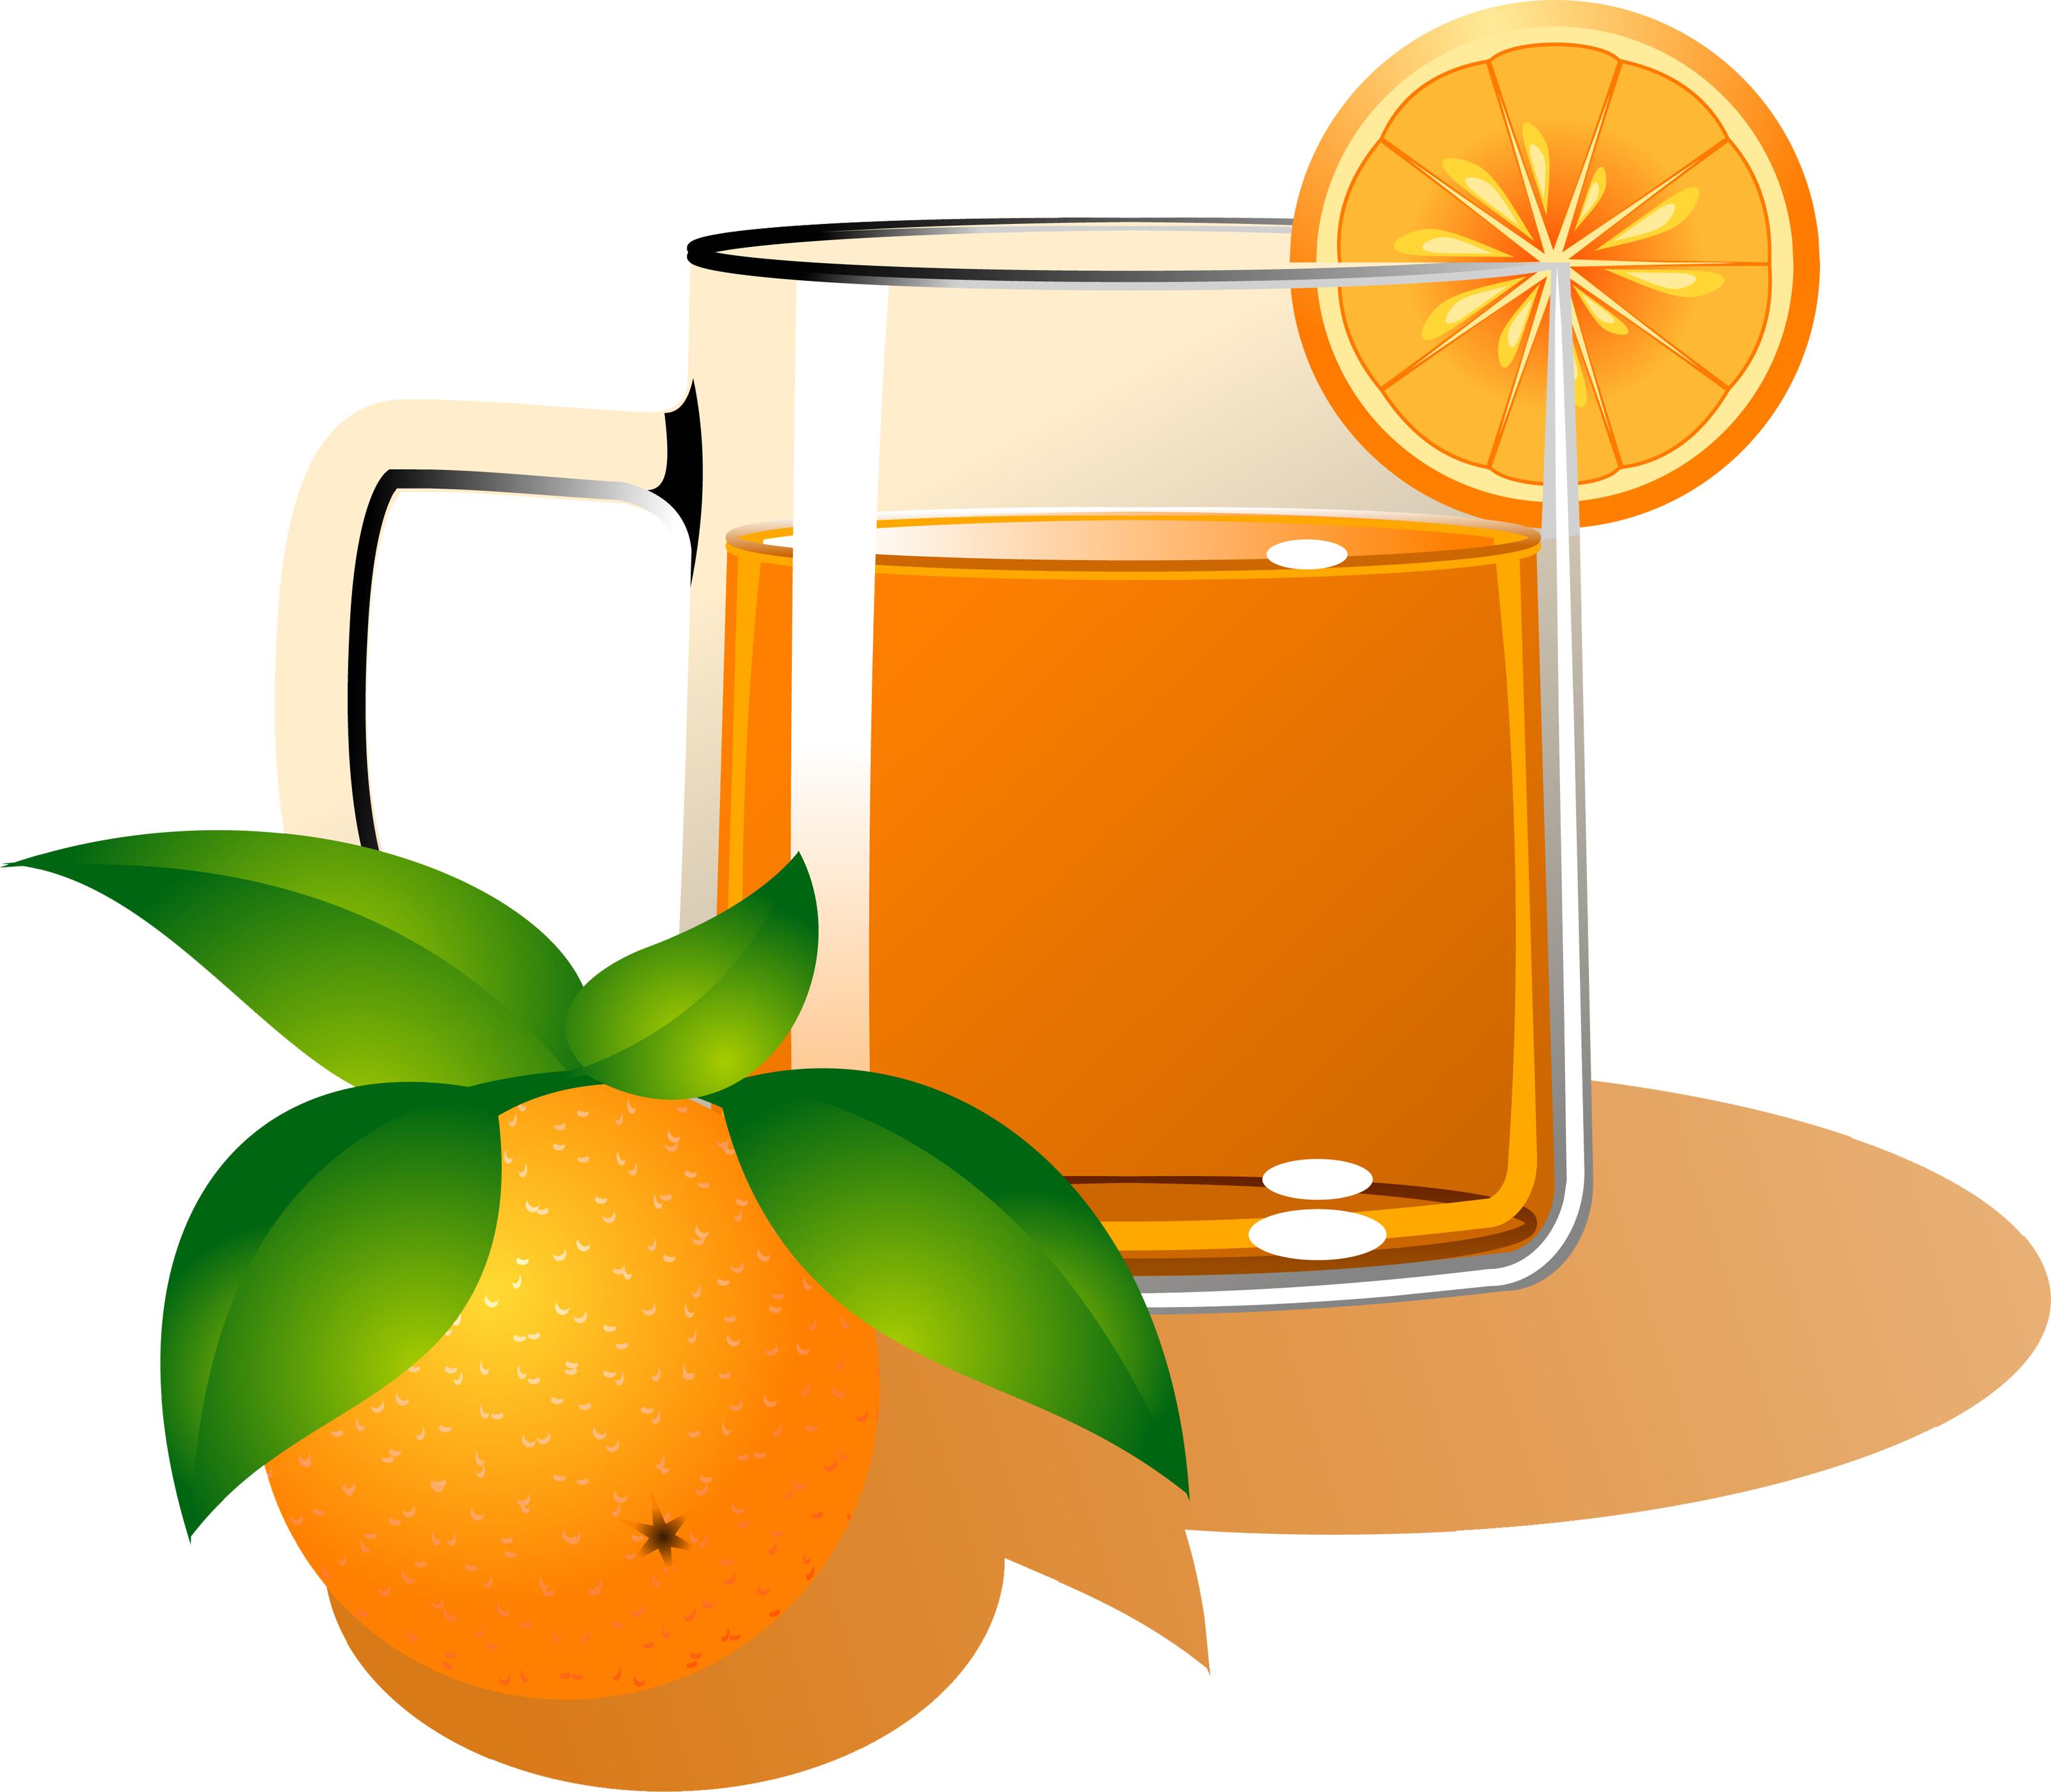 Images For Clip Art Apple Juice-Images For Clip Art Apple Juice-16